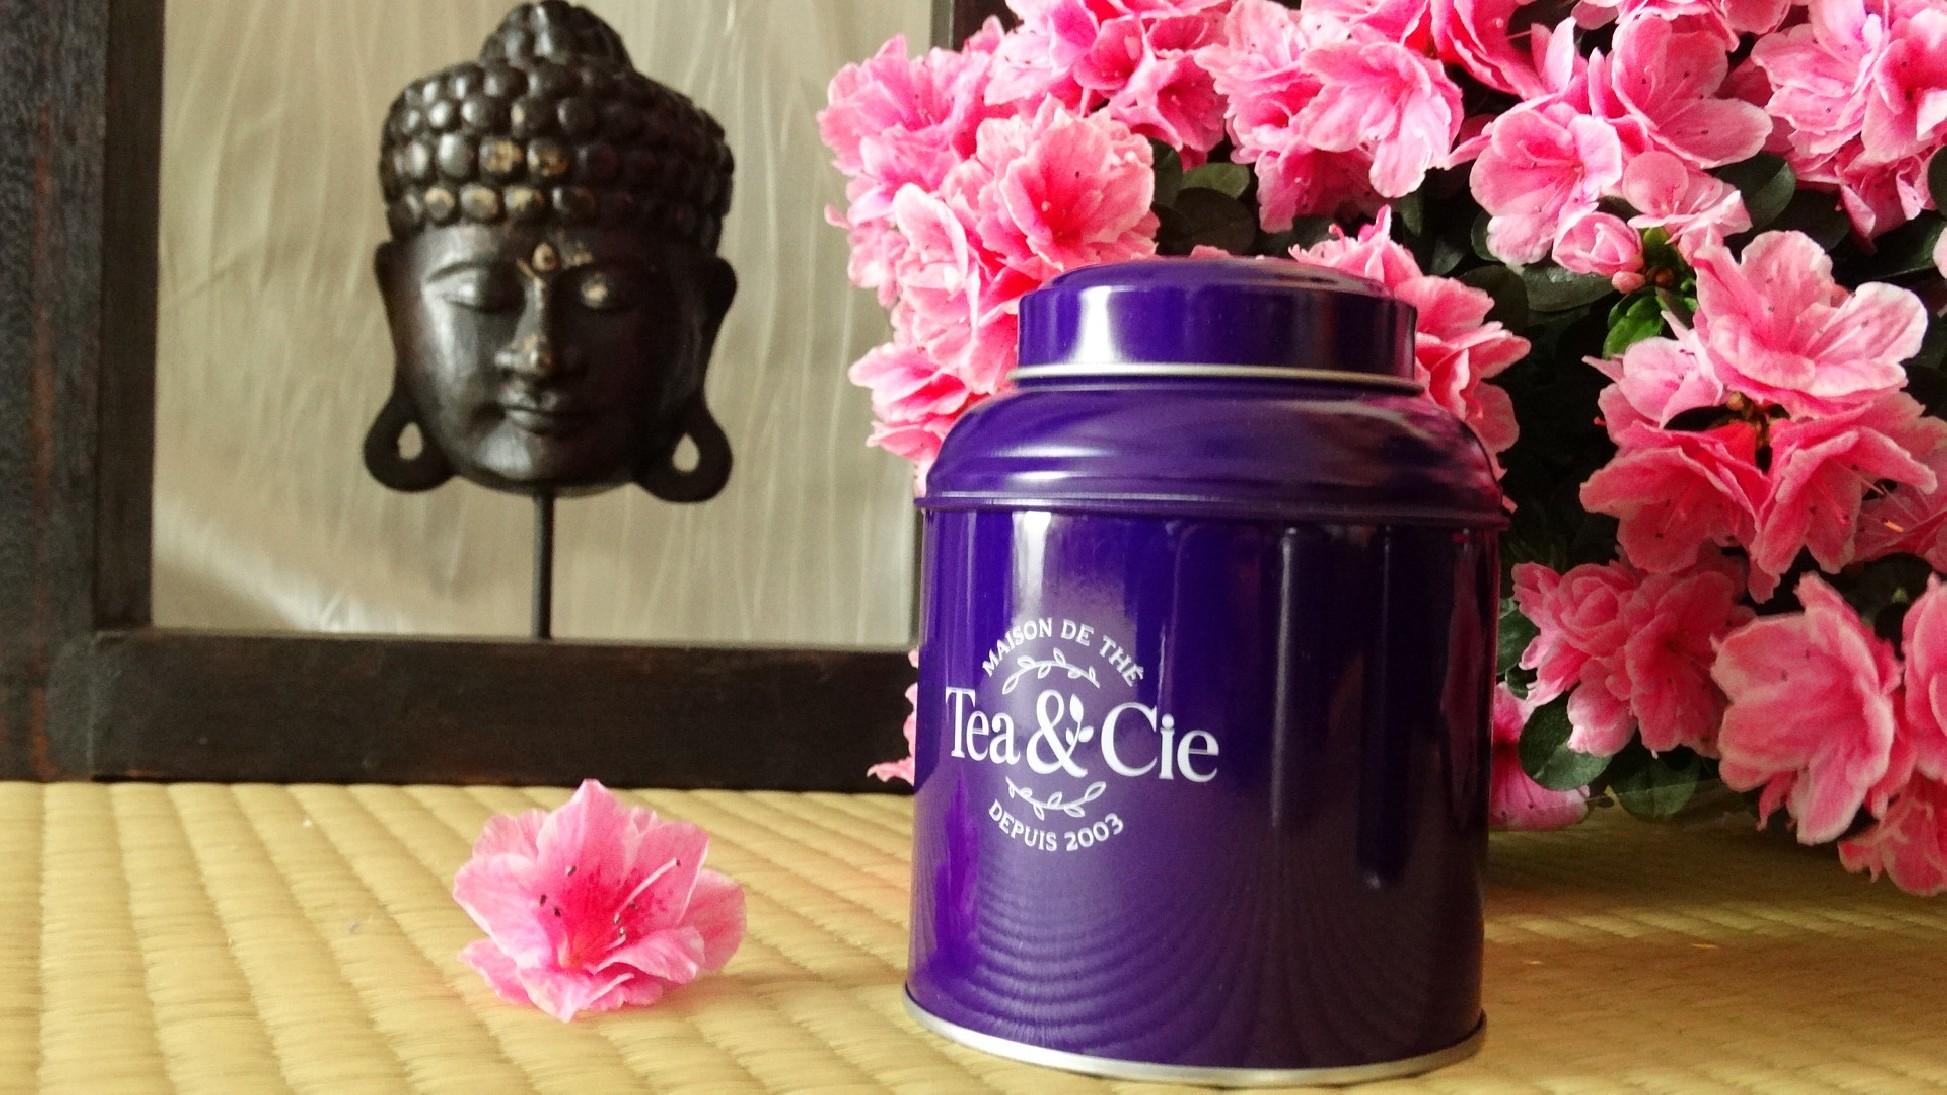 la petite boite jaune violette Tea & Cie www.teacie.com